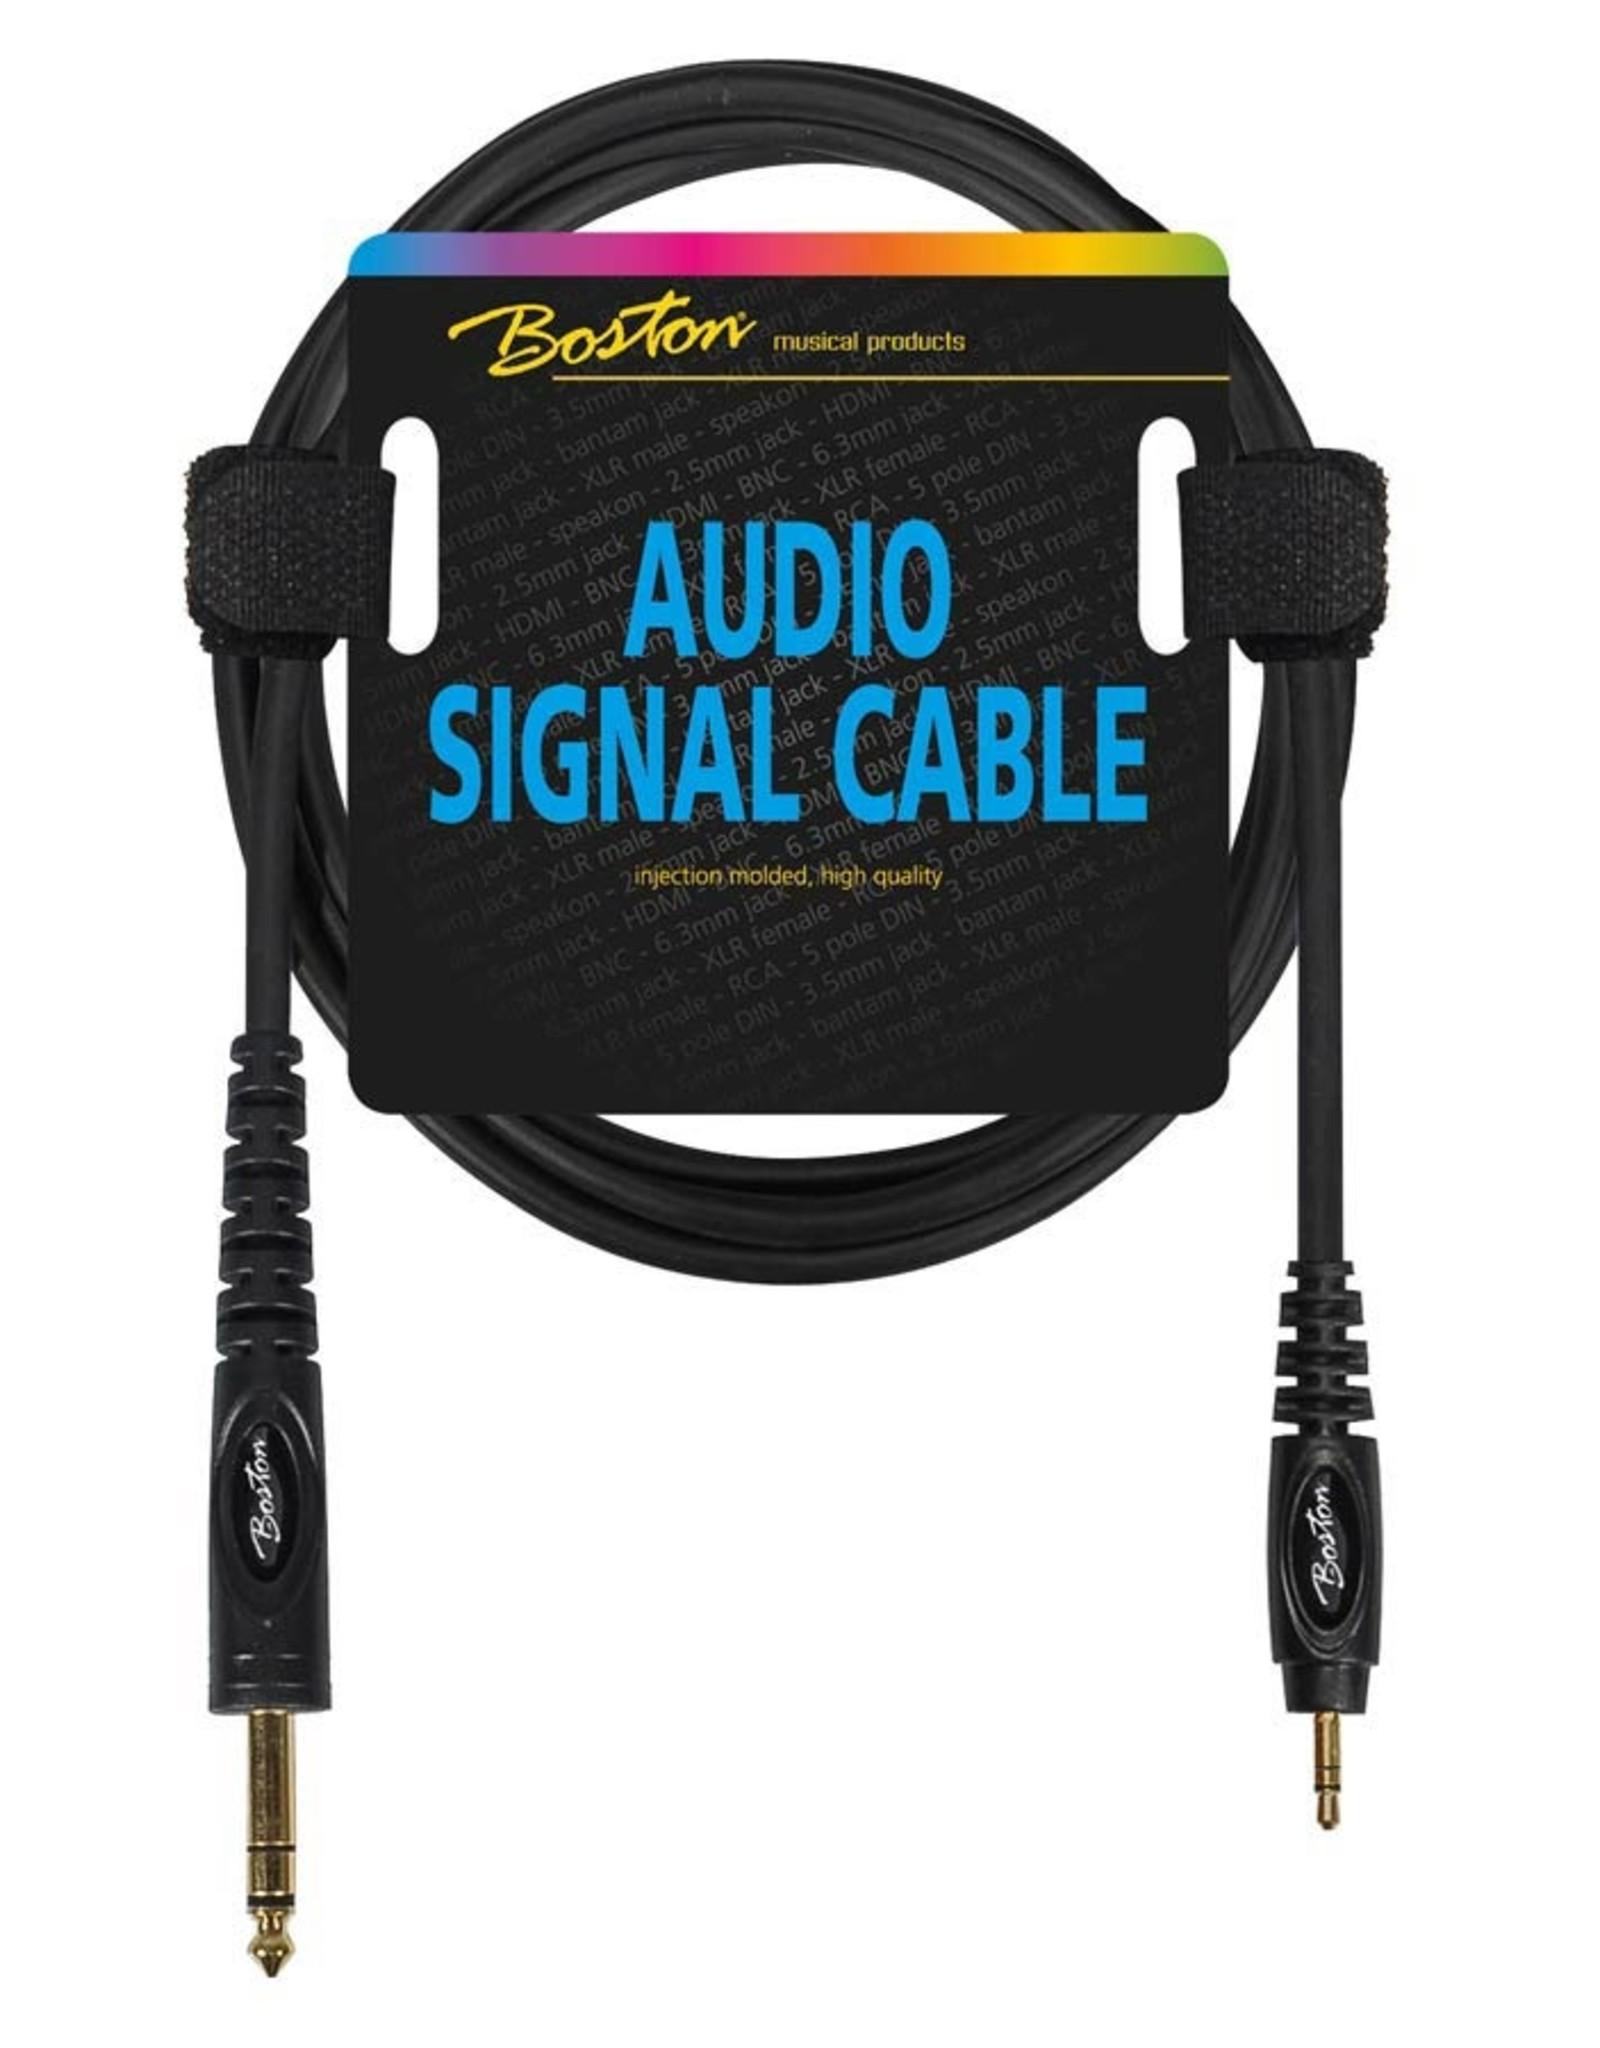 Boston  AC-262-300| Boston audio signaalkabel